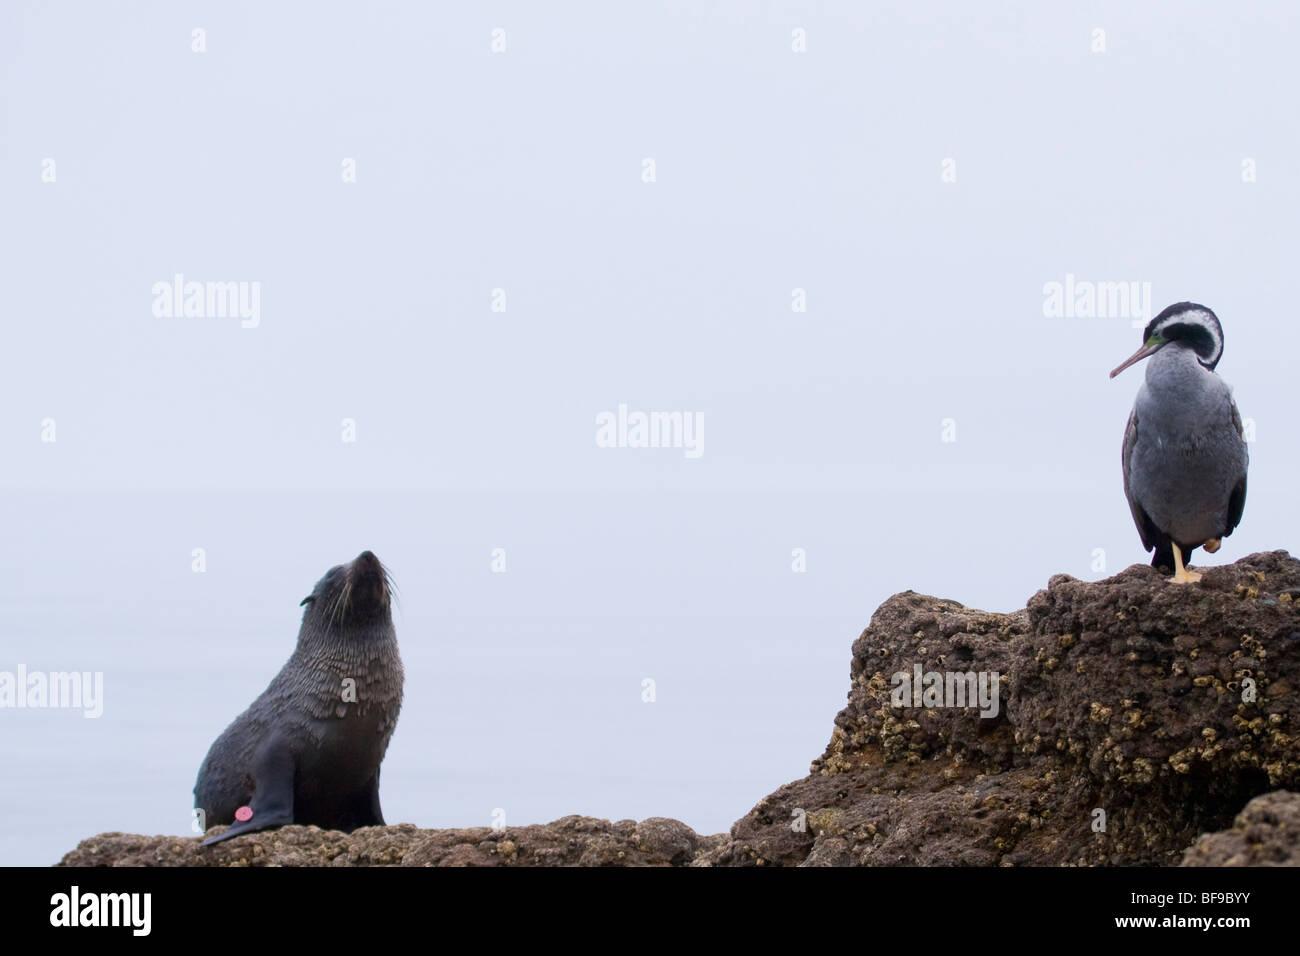 Spotted Shag (Phalacrocorax punctatus) and a New Zealand Fur Seal (Arctocephalus forsteri) at Patons Rock, New Zealand - Stock Image